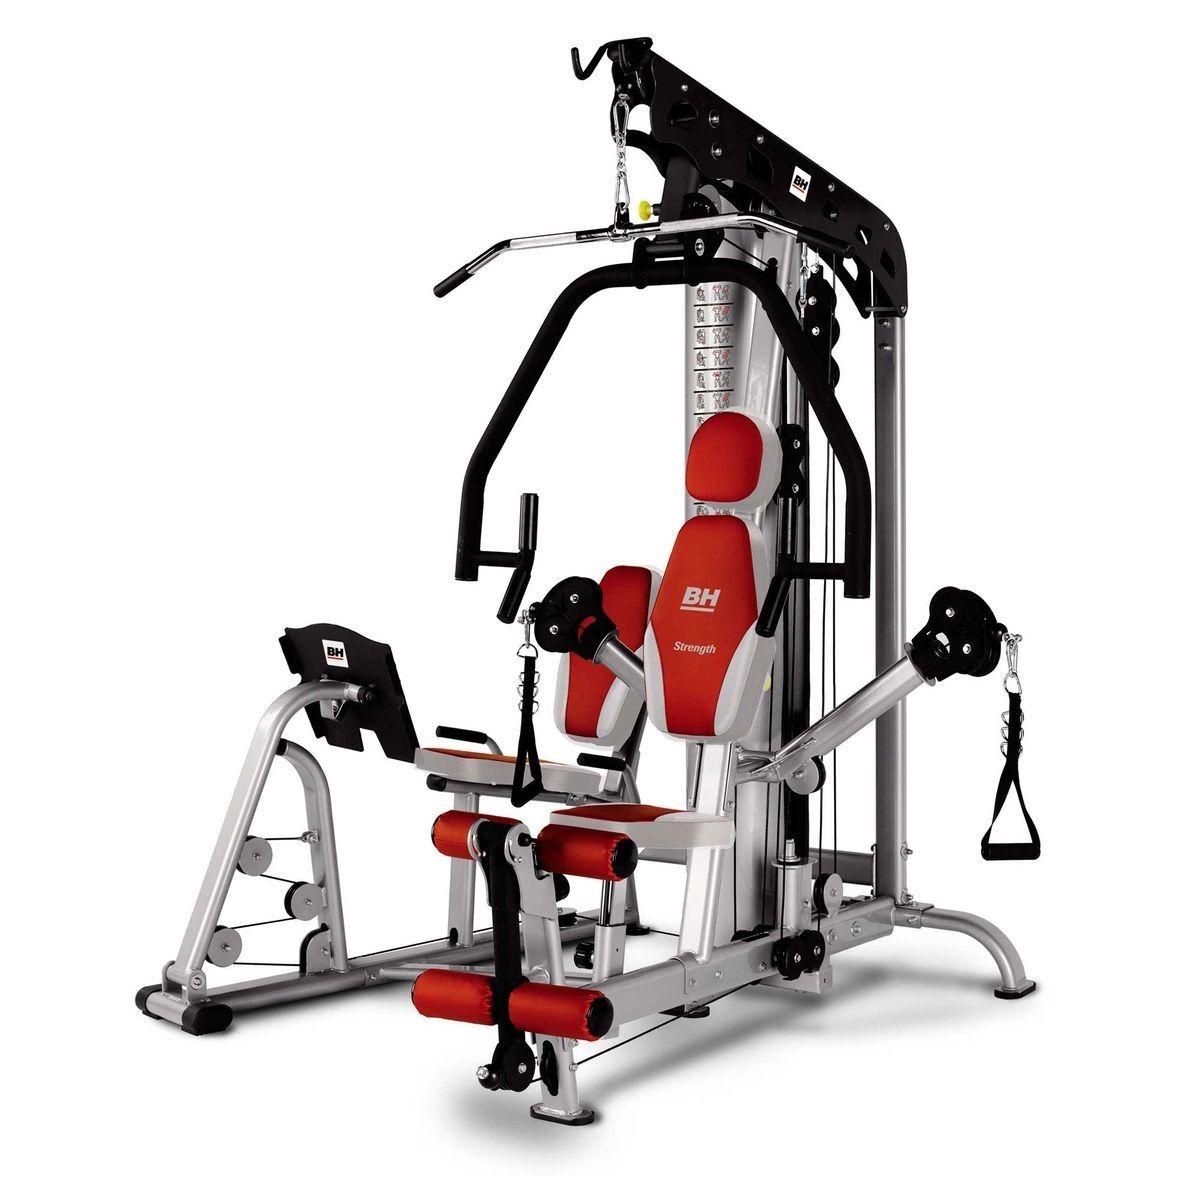 Bh fitness tt pro g156 multistation pour utilisation semi